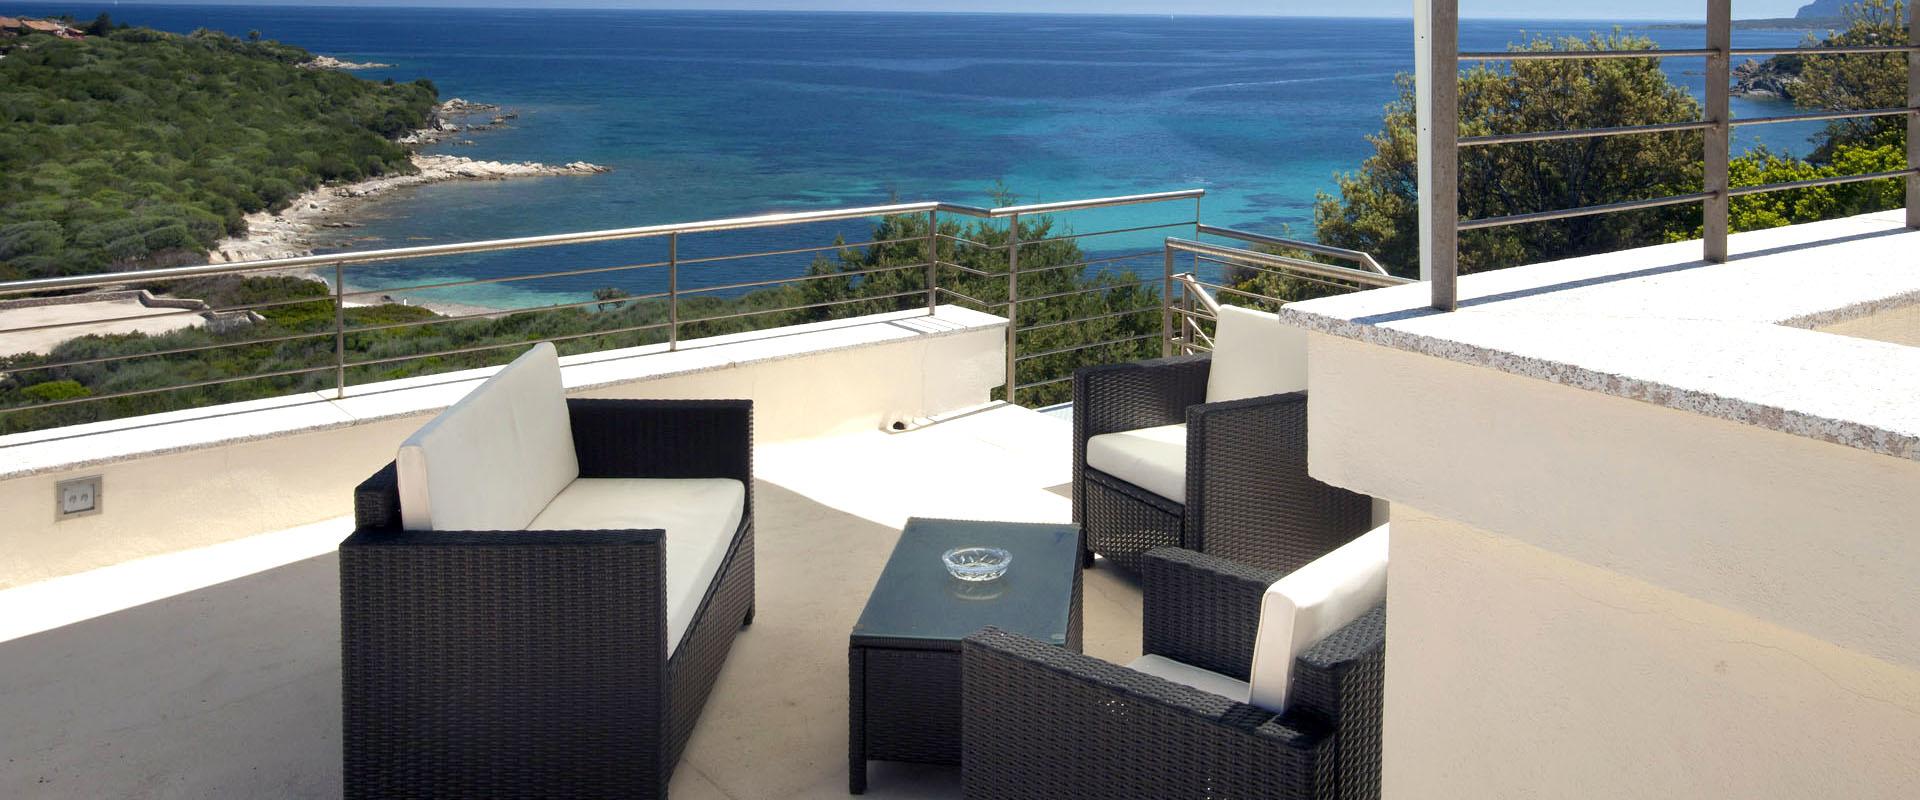 Luxury-Villa-WhiteBEach-Portorotondo-Sardinia-Rent3